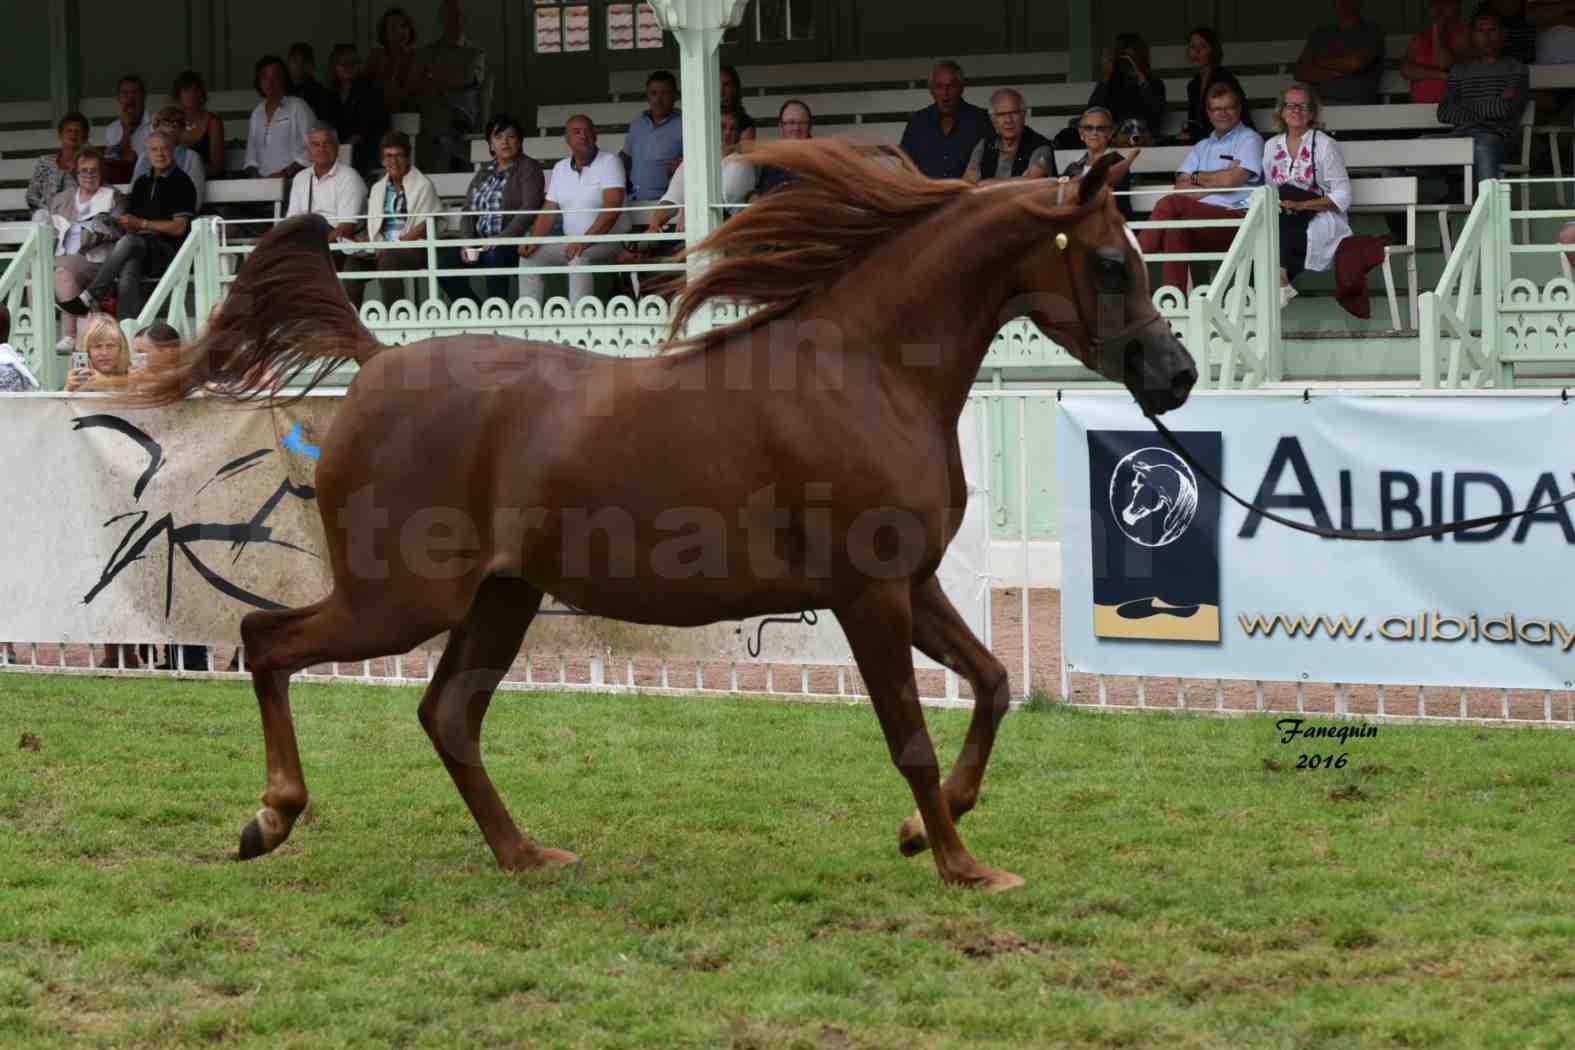 International Arabian Horse Show B de VICHY 2016 - PEARL DE DJOON - Notre Sélection - 04